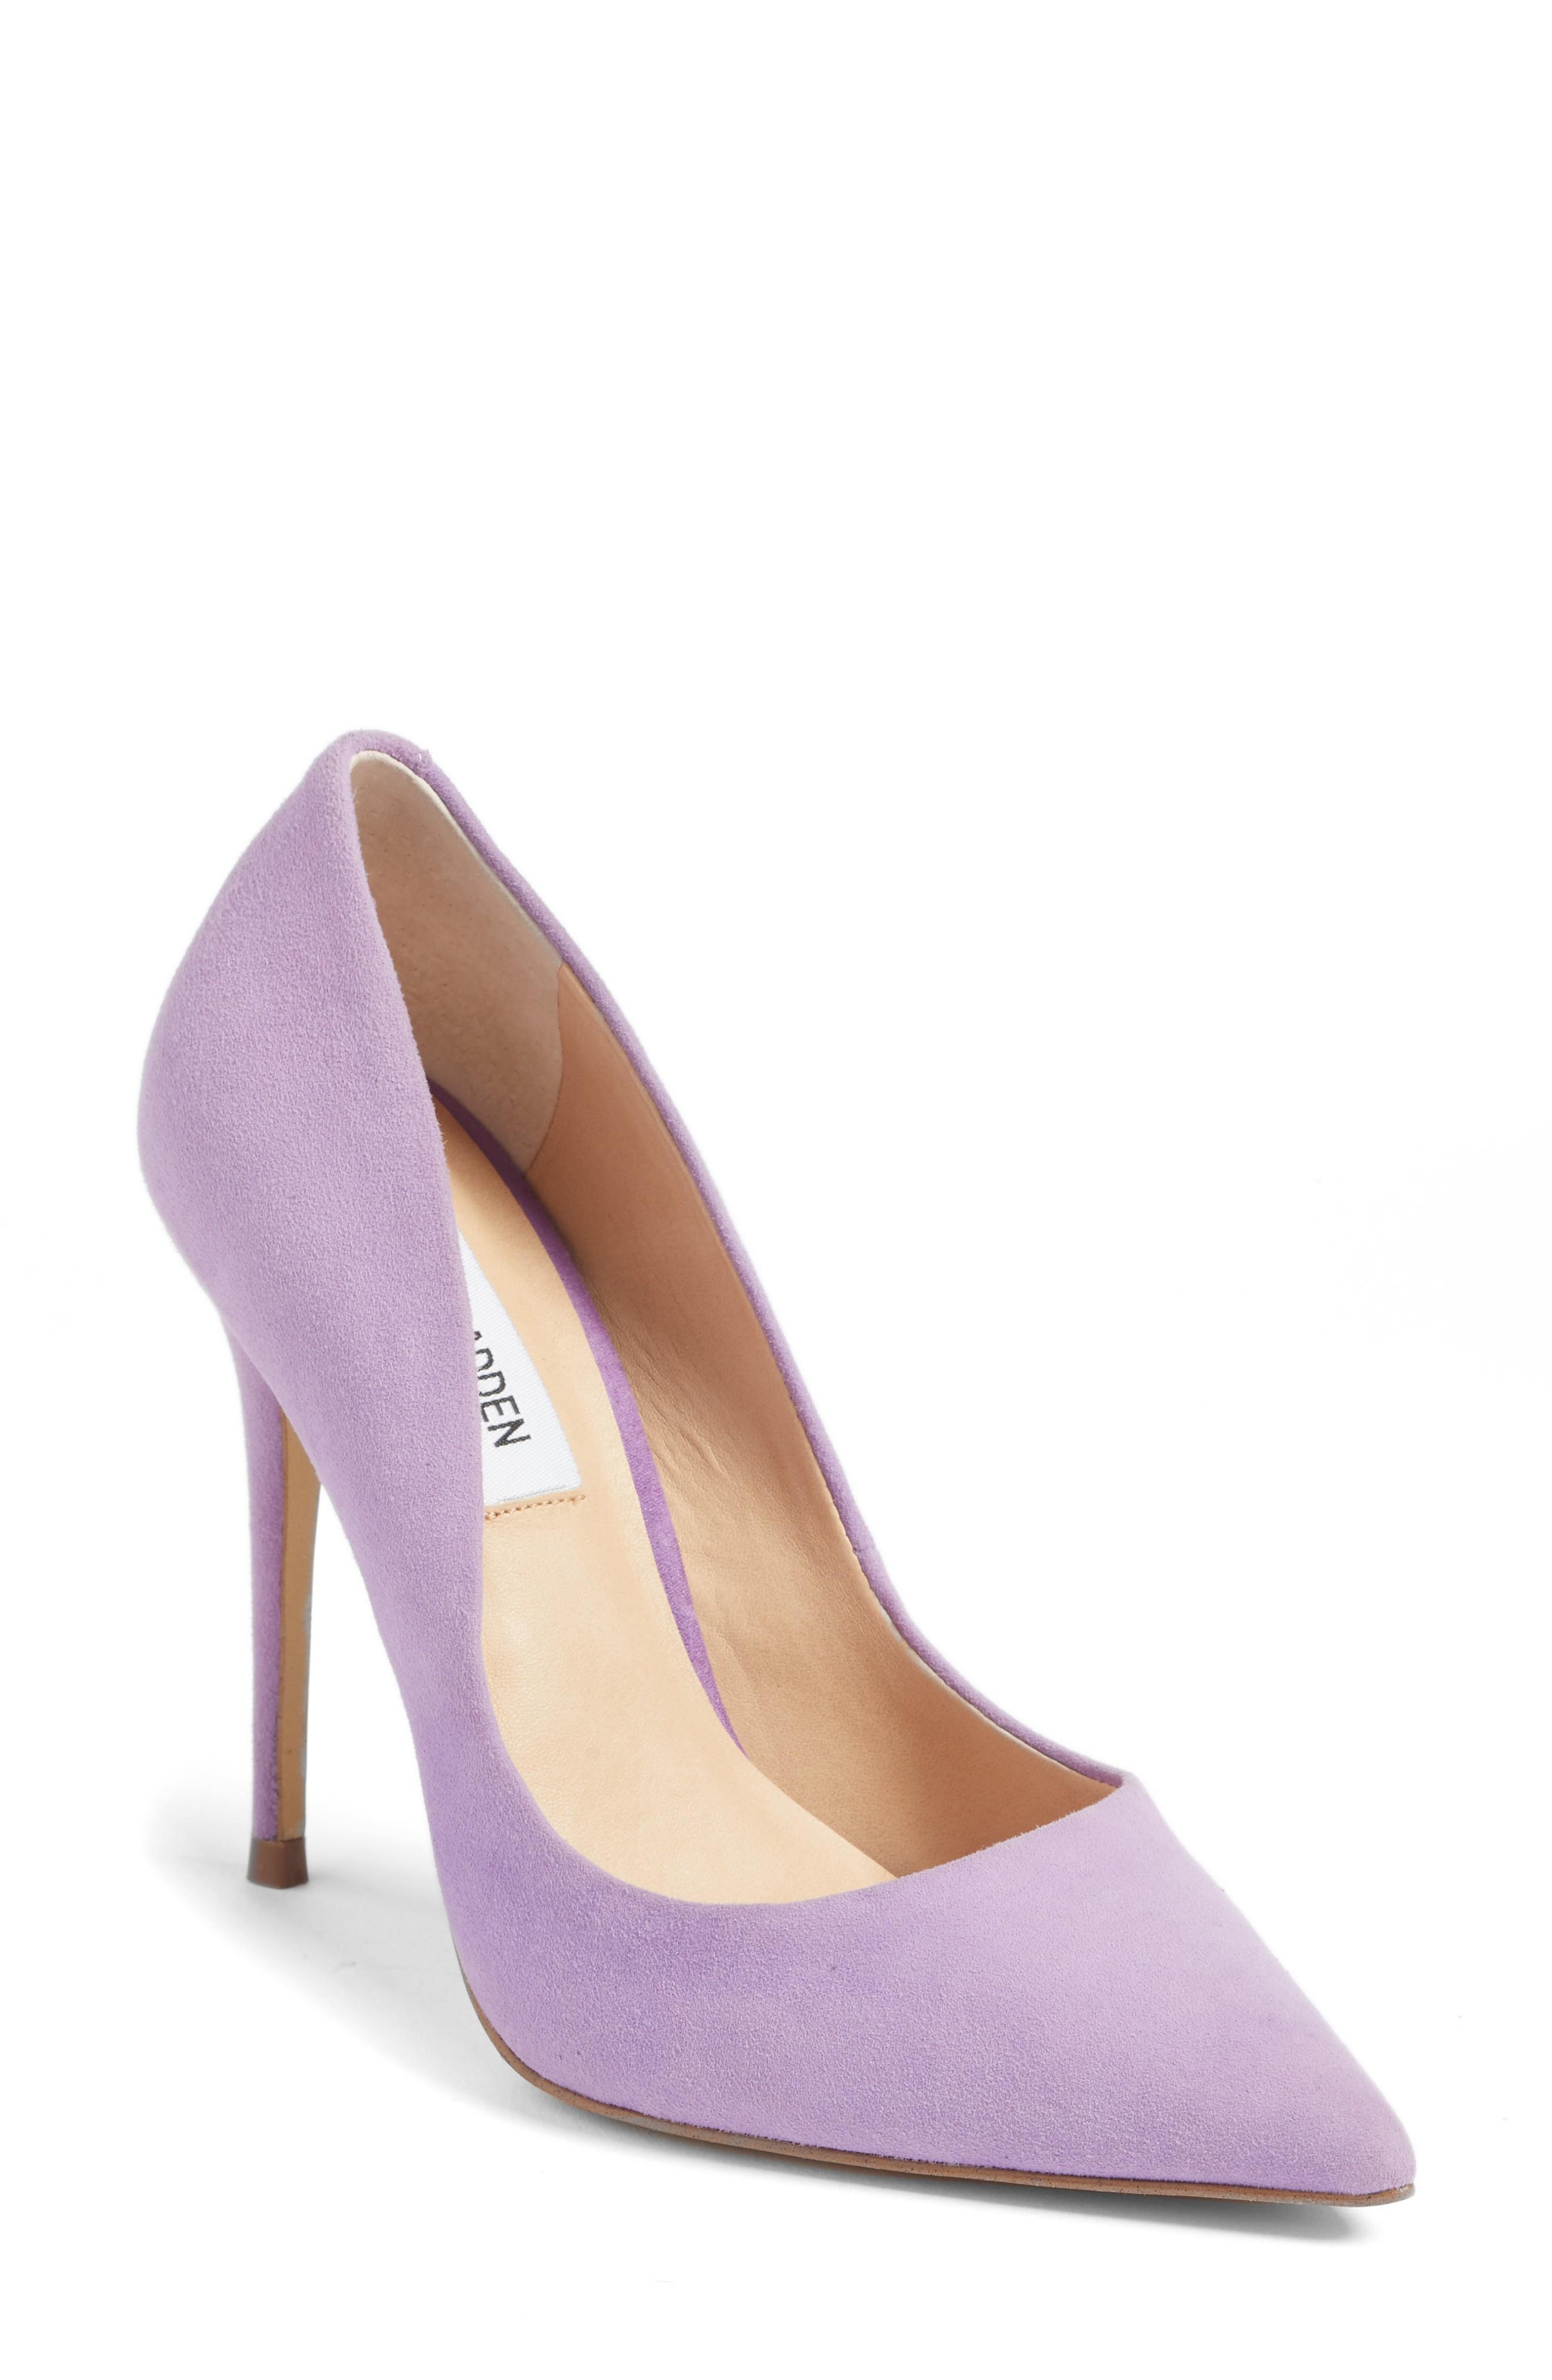 e60cbb04864 Daisie Pointy-Toe Pump in Lavender Suede